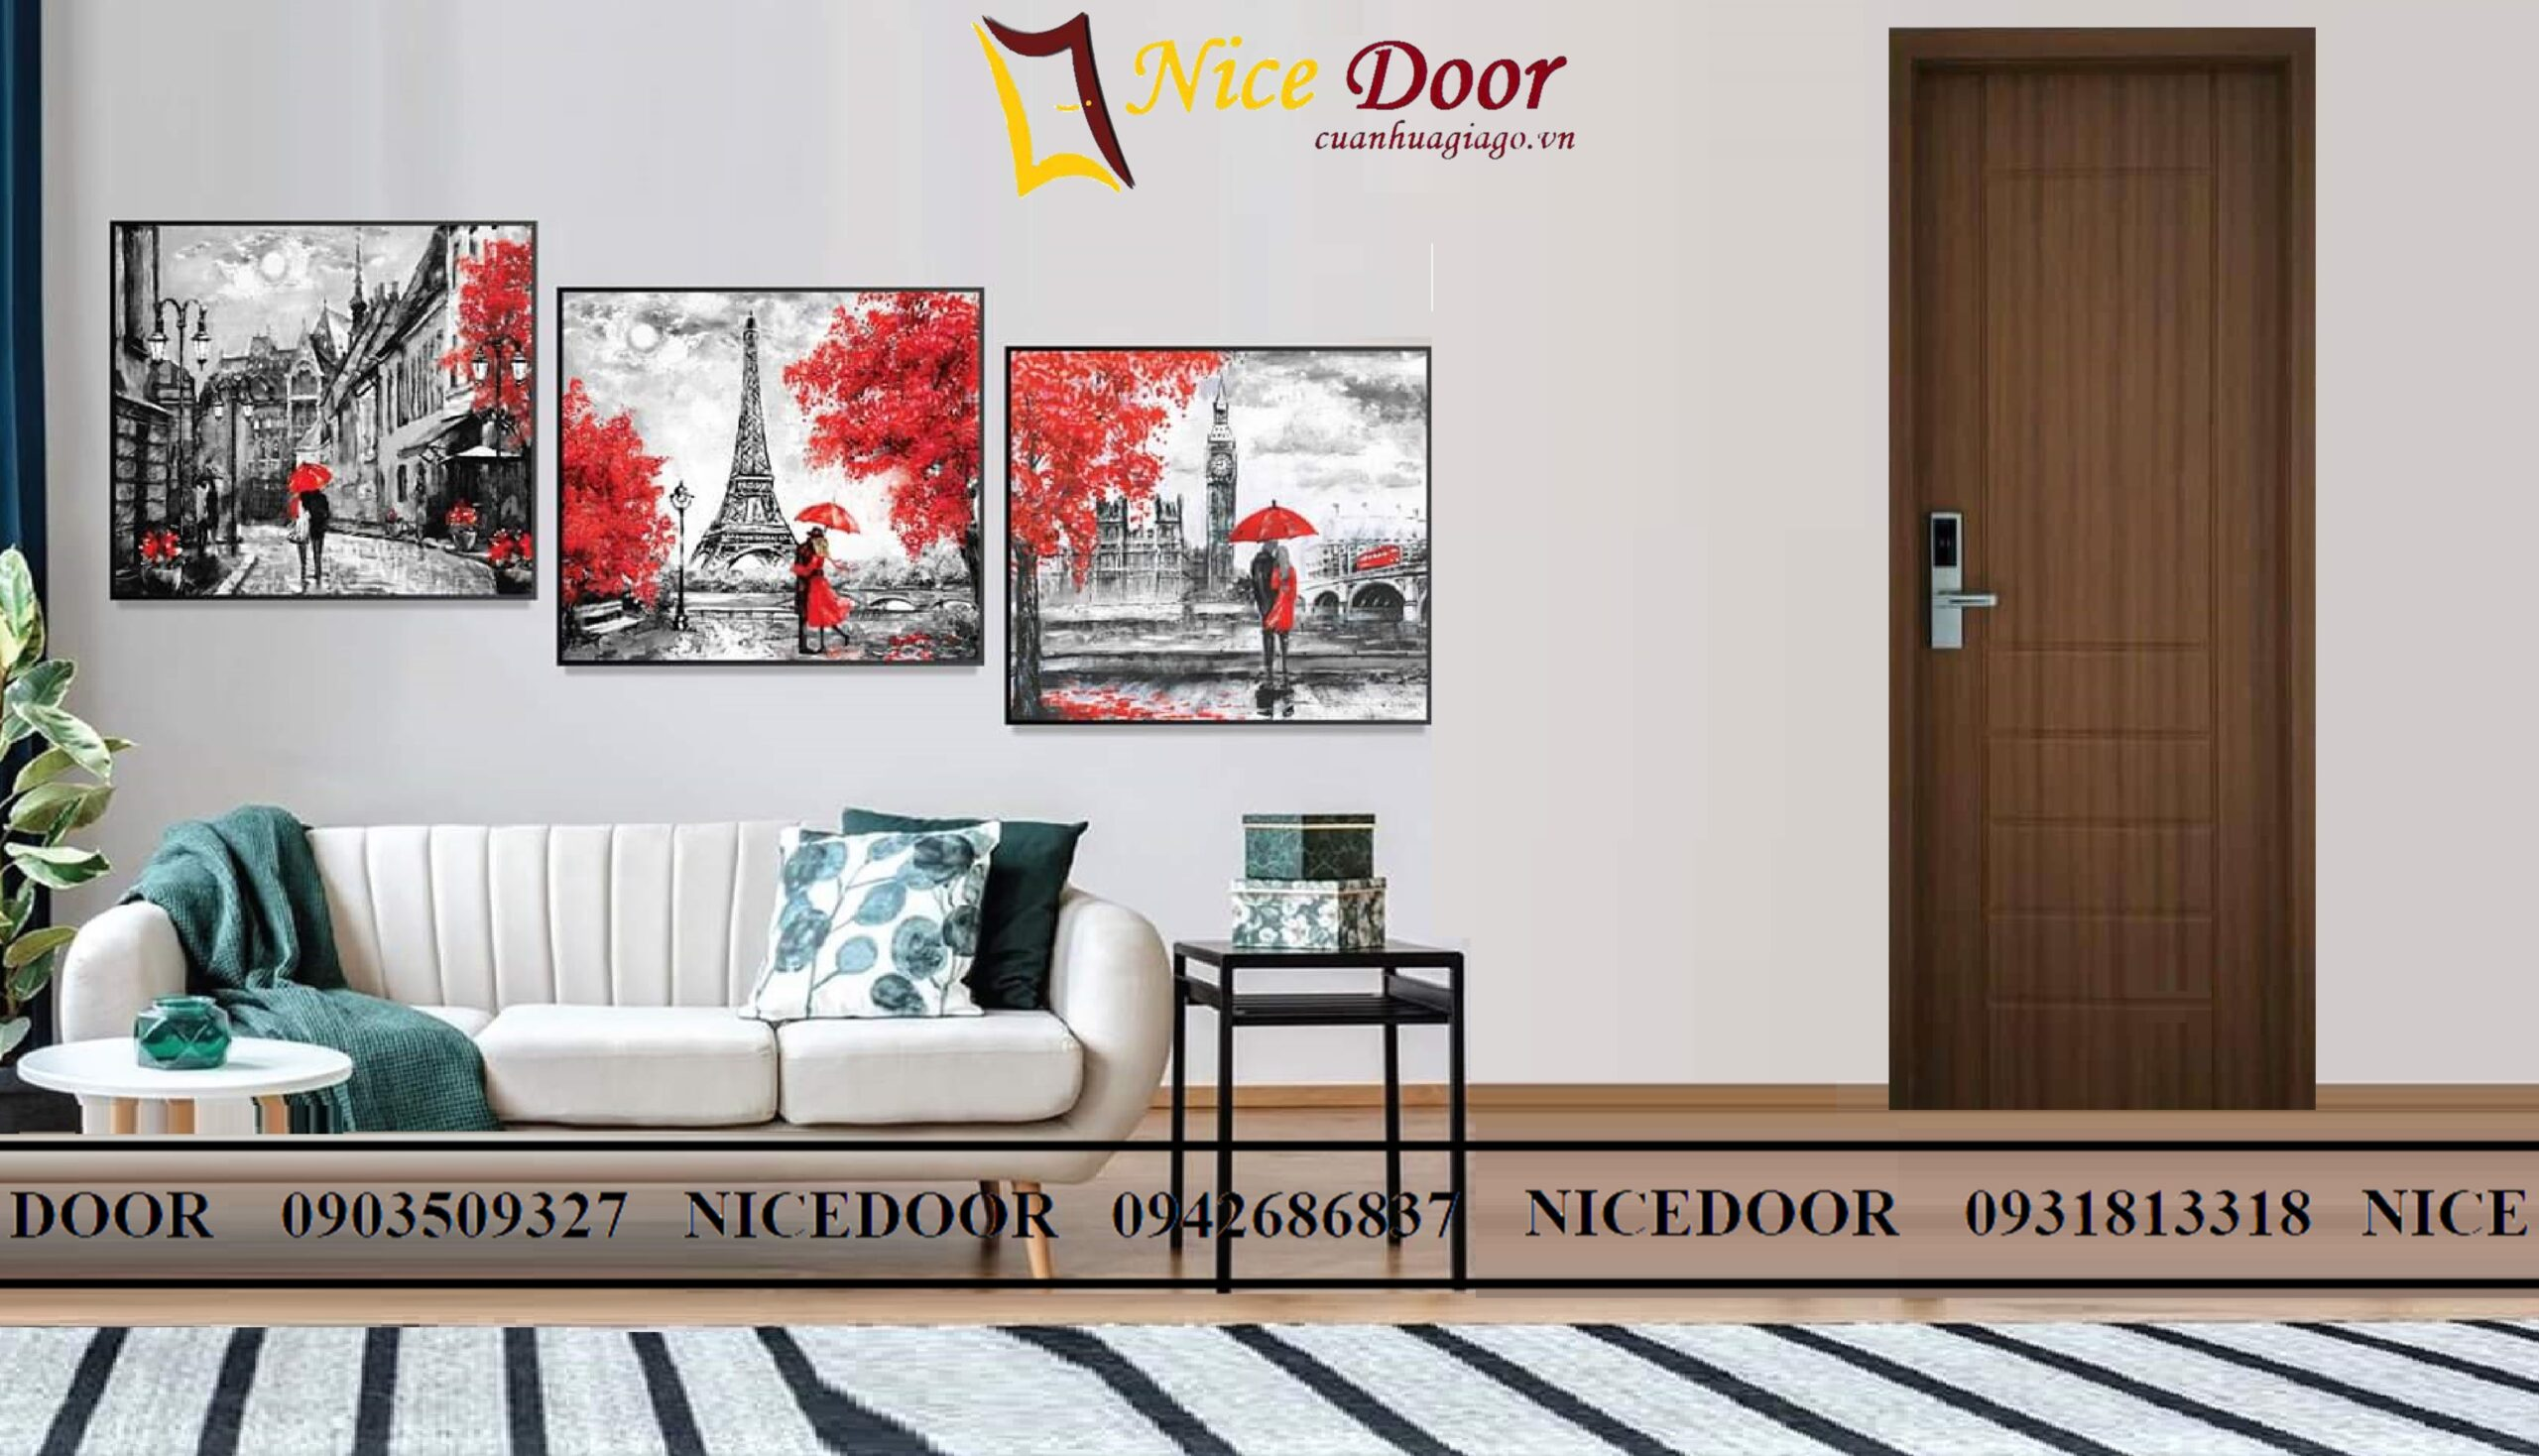 cửa-nhựa-giả-gỗ-abs-hàn-quốc-nice-door